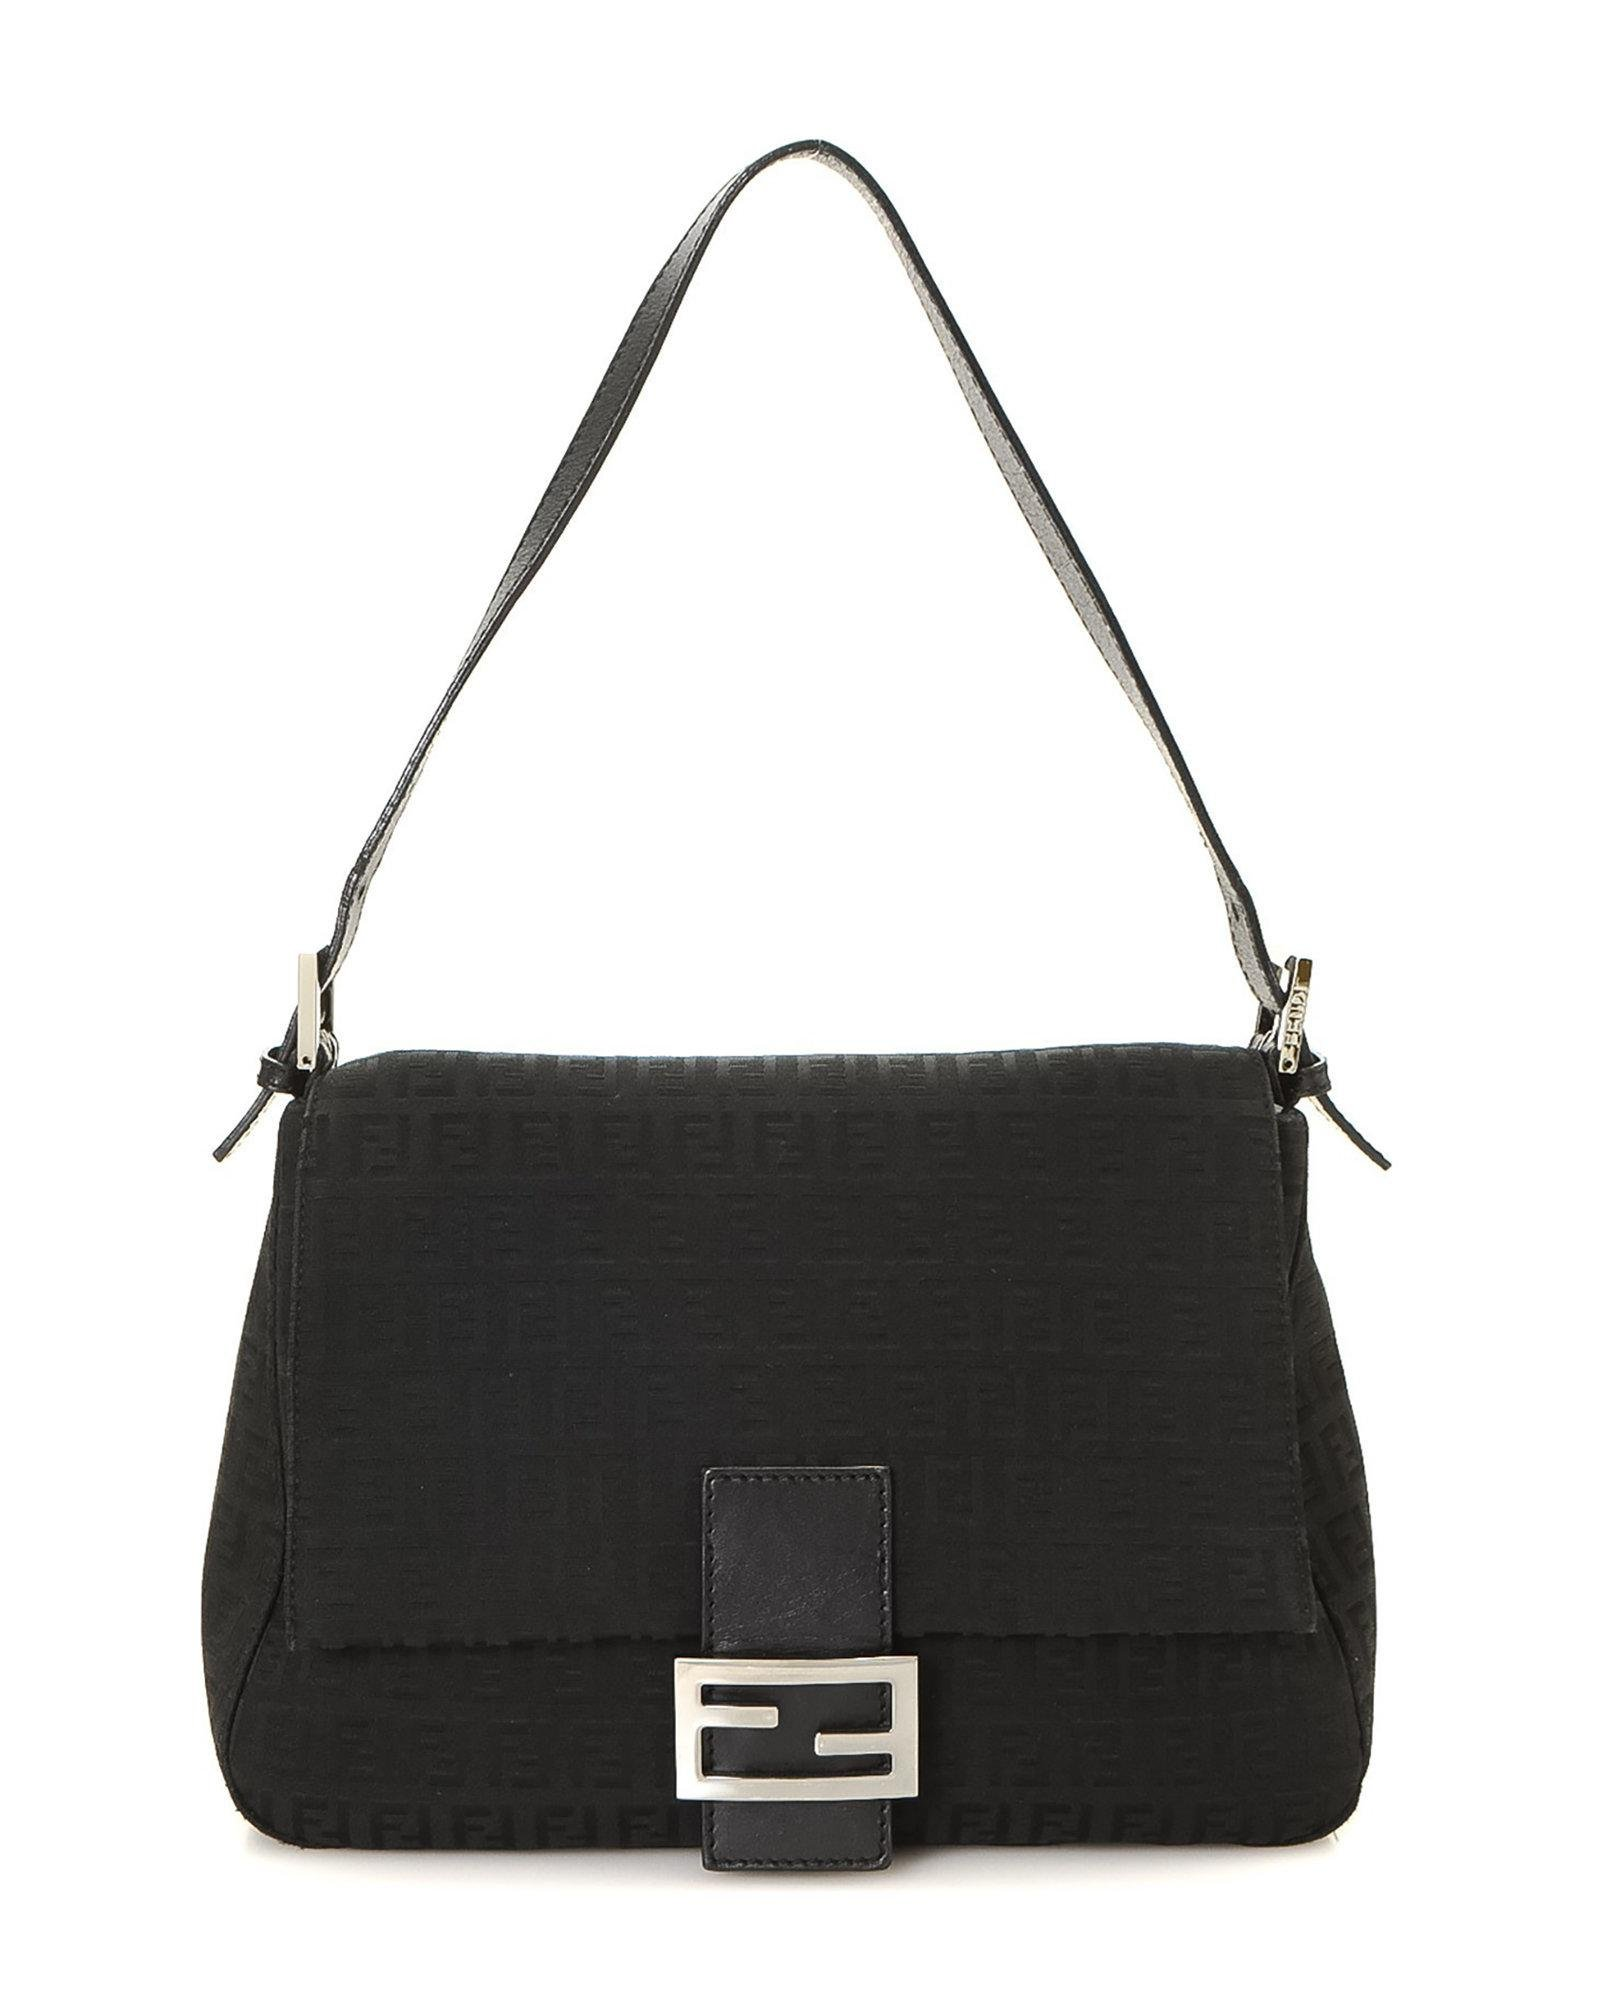 d164521463 Lyst - Fendi Zucchino Mamma Baguette Shoulder Bag - Vintage in Black